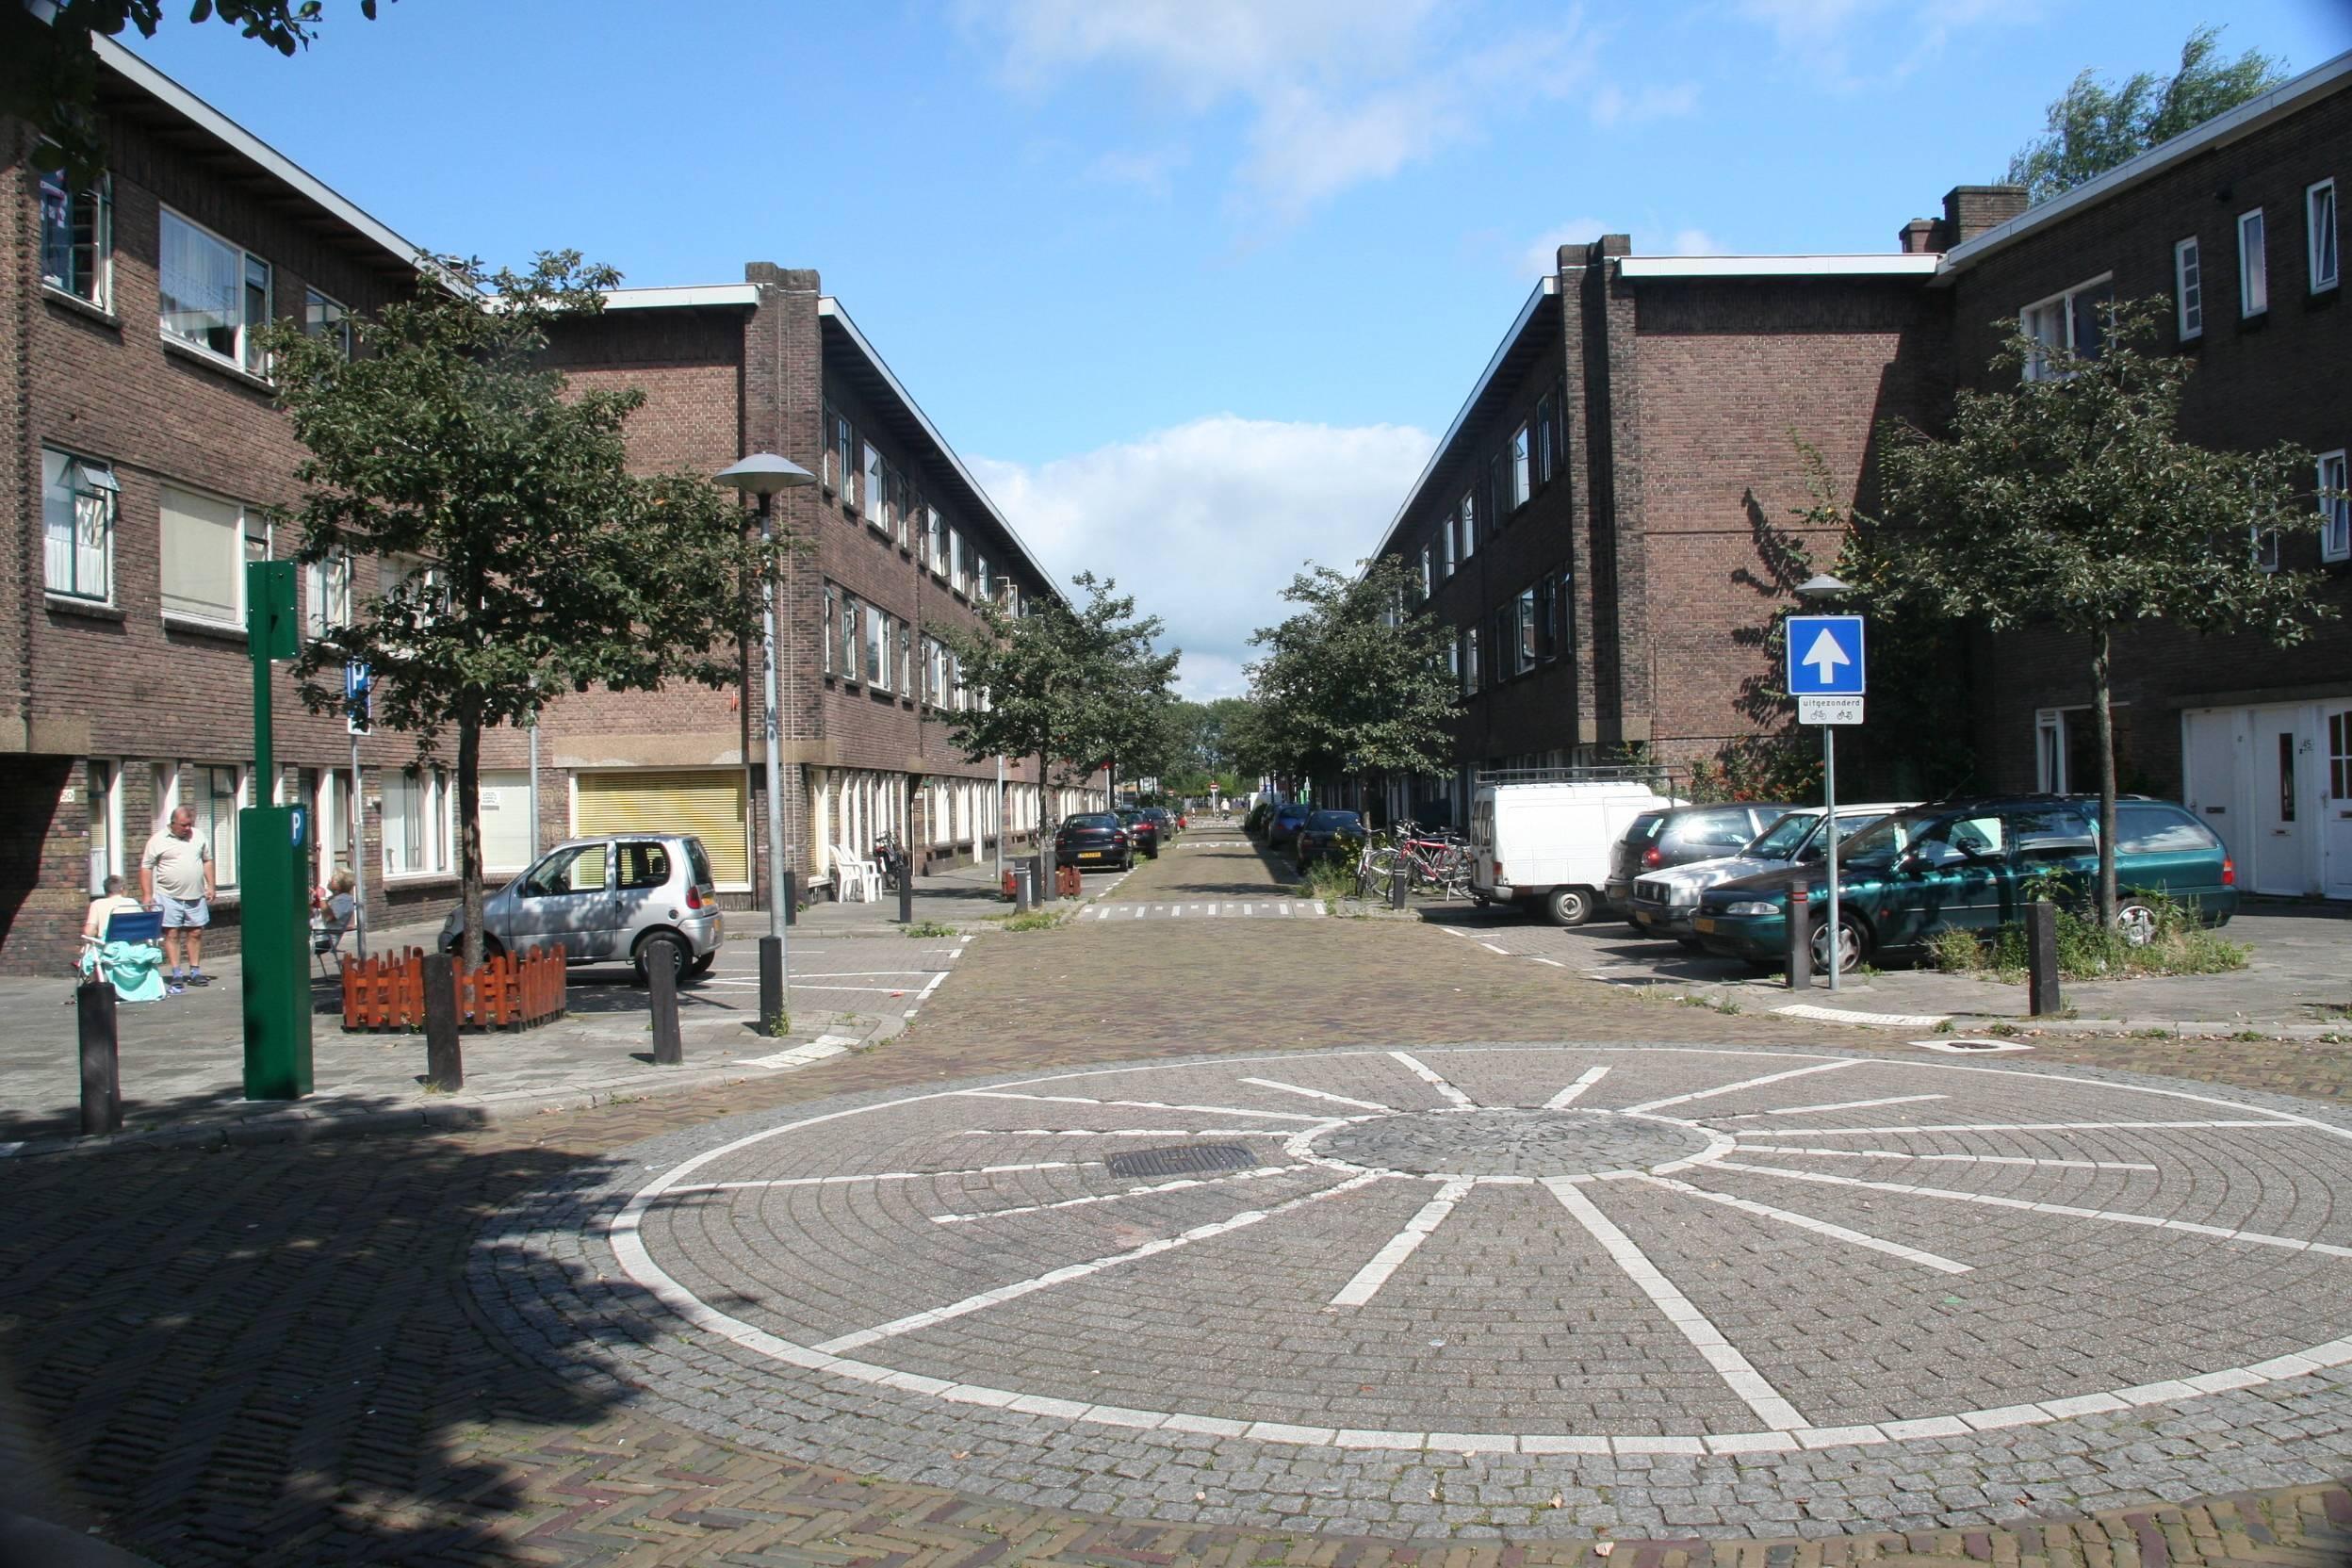 https://public.parariusoffice.nl/293/photos/huge/51693006.1528807621-432.jpg